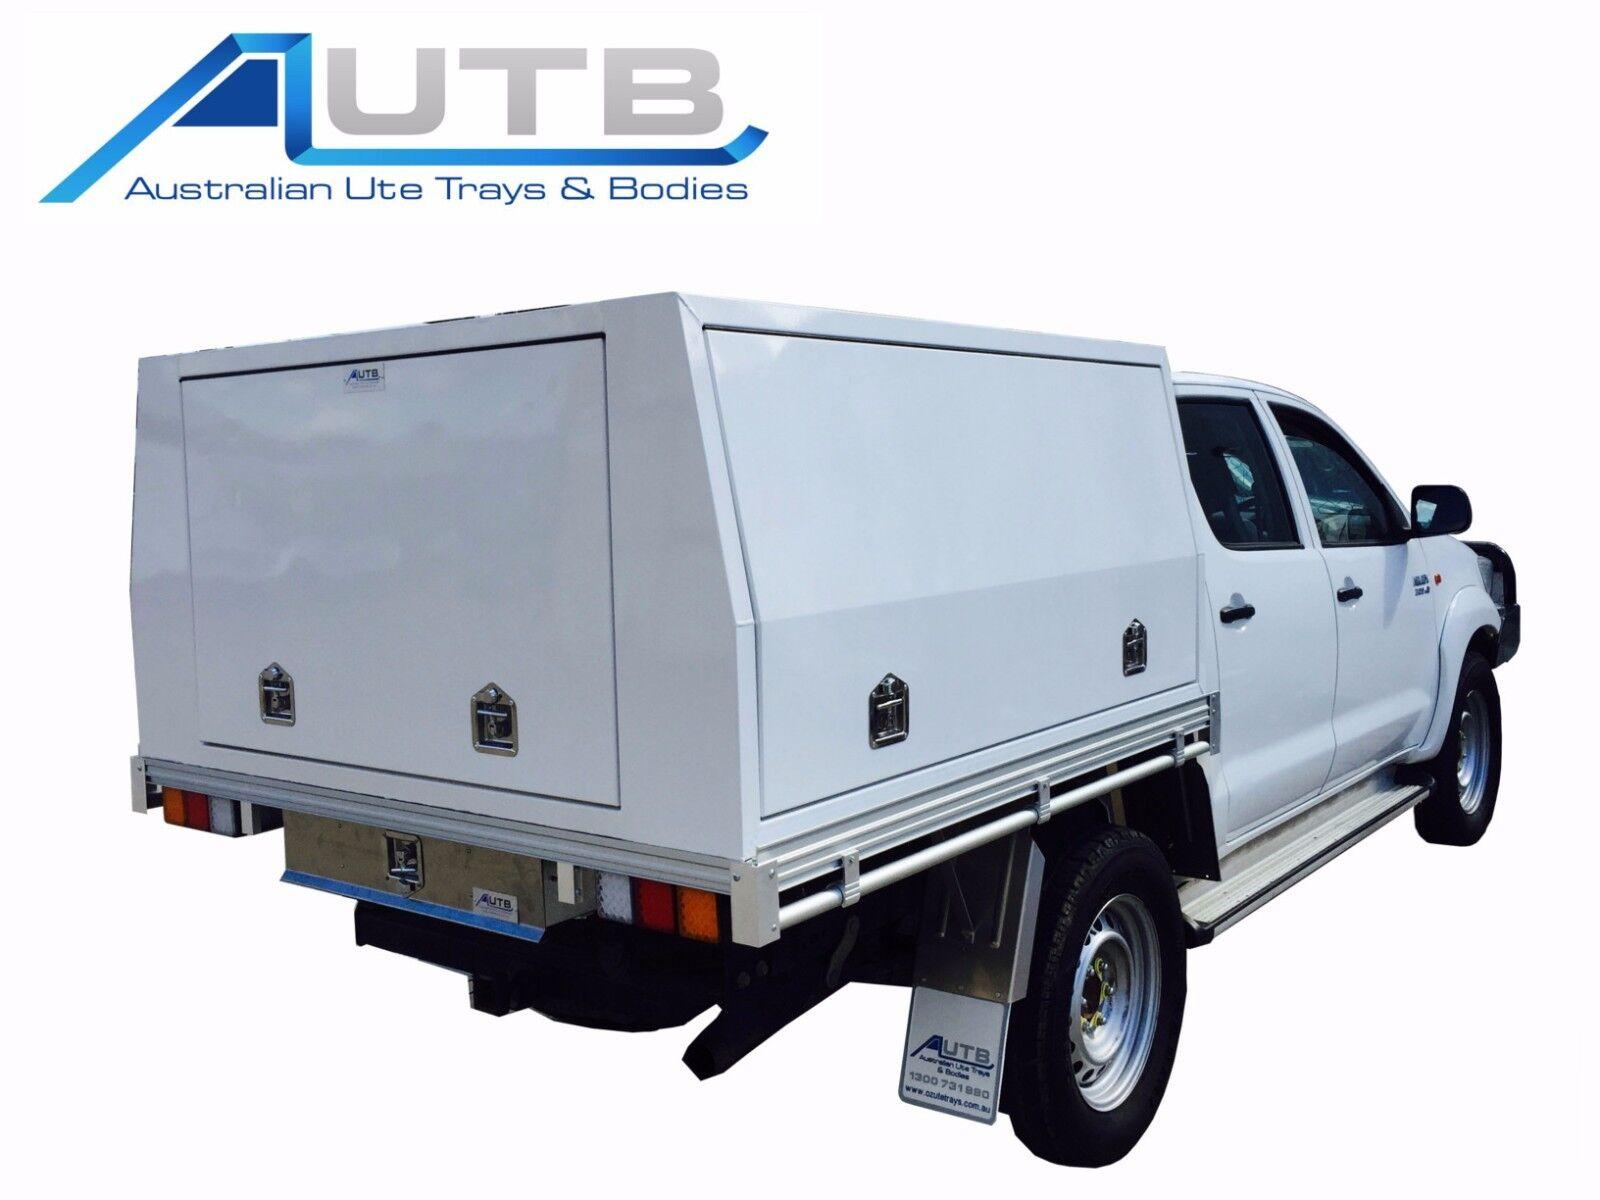 Dual Cab Hilux Aluminium Canopy - 1800mm x 1800mm x 860mm 3 Door Powdercoated  sc 1 st  eBay & Dual Cab Hilux Aluminium Canopy - 1800mm x 1800mm x 860mm 3 Door ...